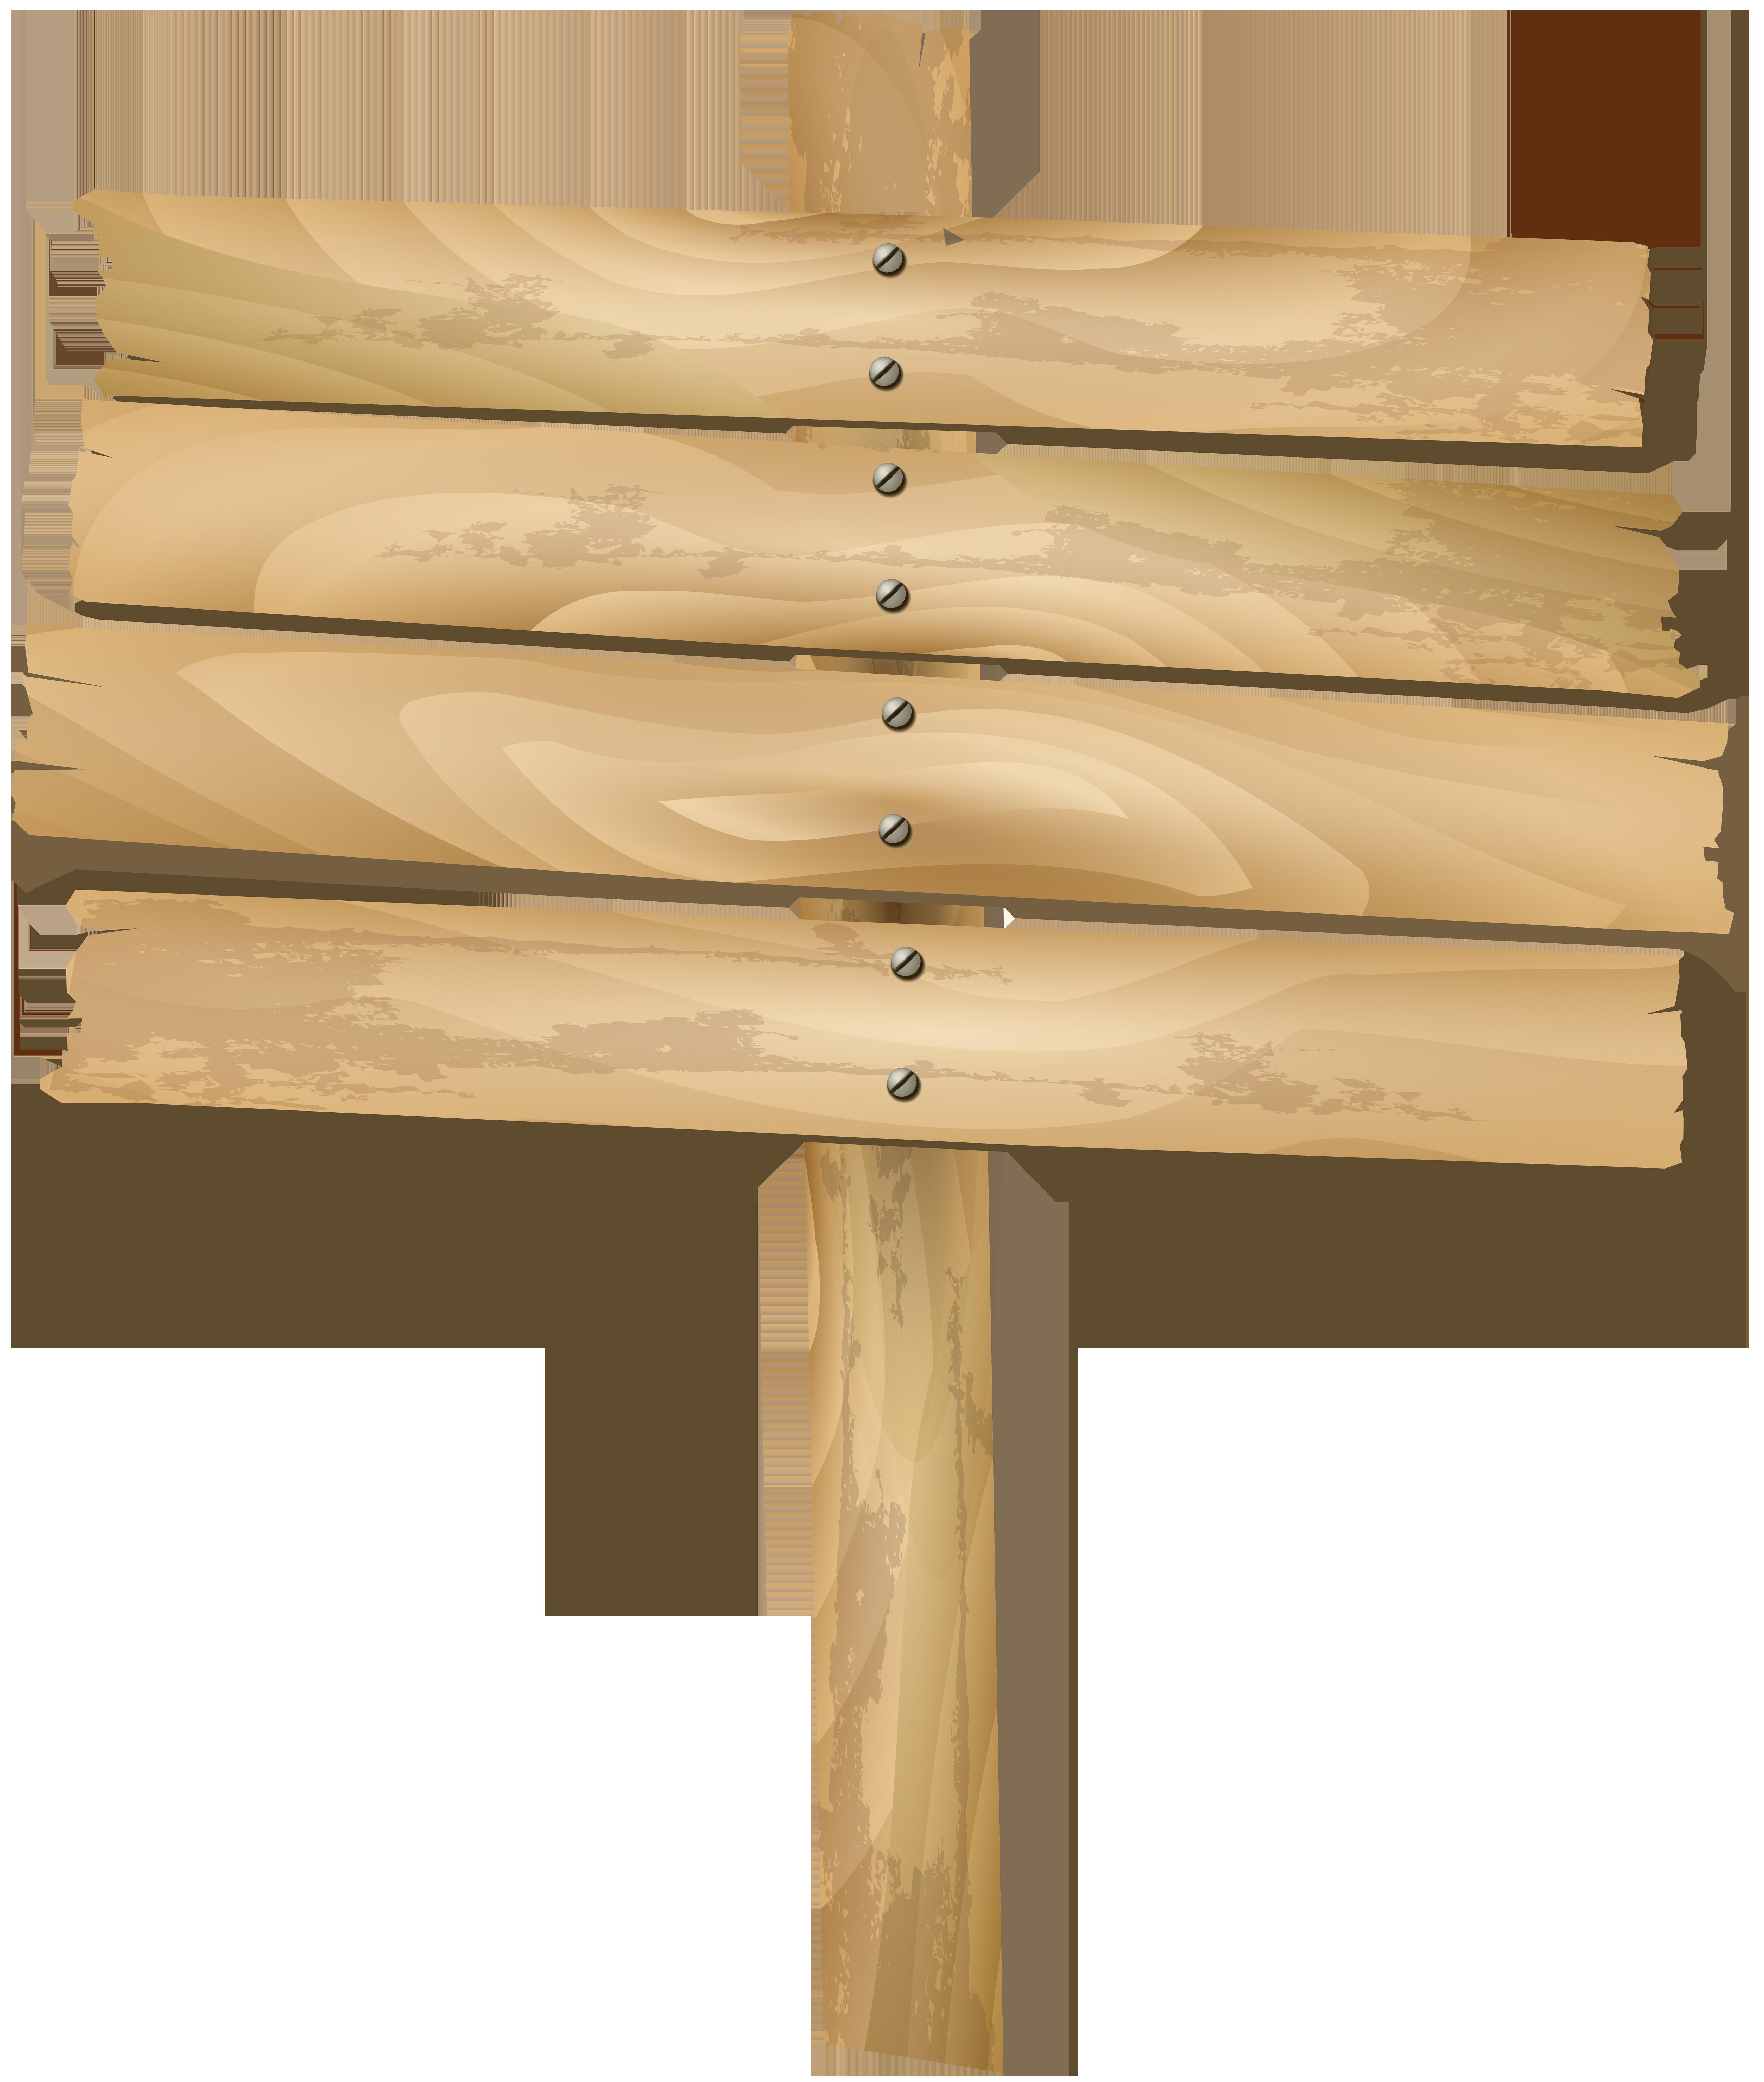 Wooden Sign Transparent Clip Art PNG Image.